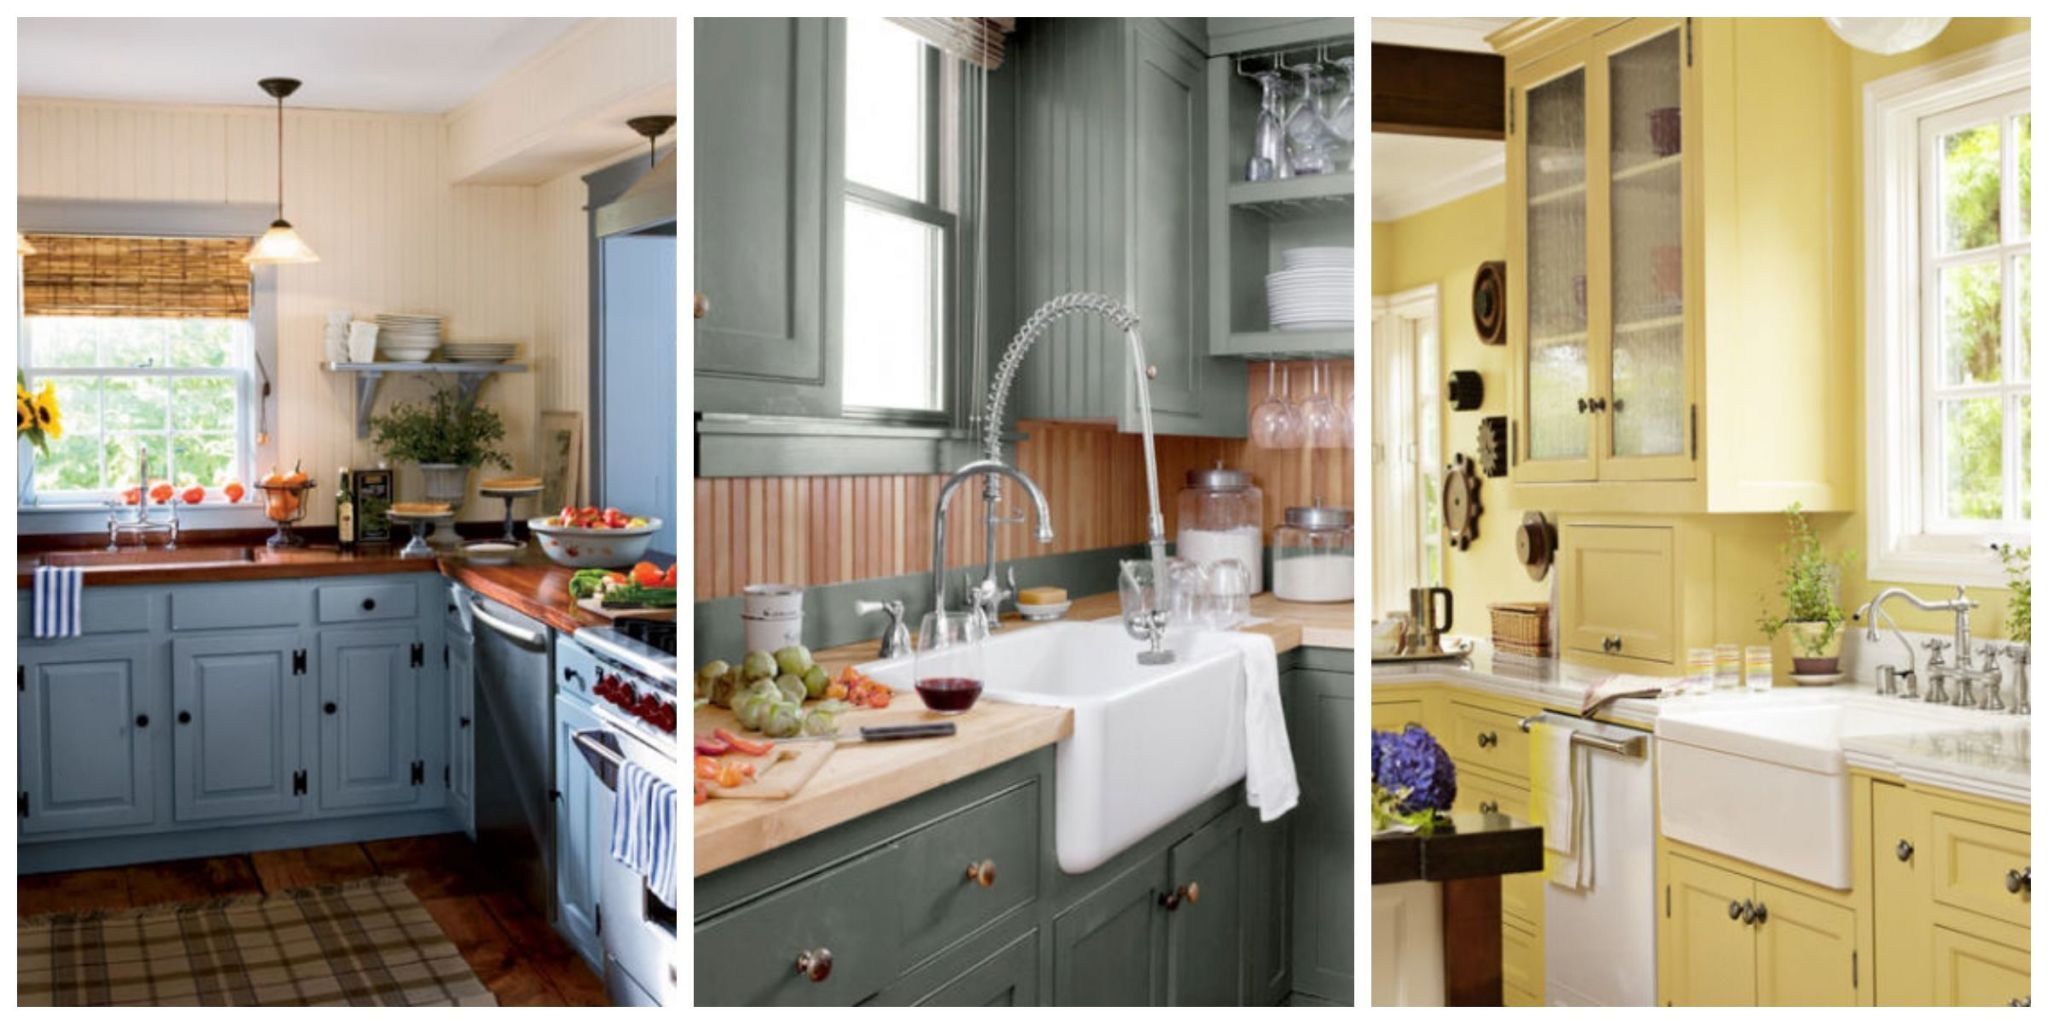 15 best kitchen color ideas paint and color schemes for kitchens rh countryliving com best color to paint a kitchen with oak cabinets best color to paint a kitchen to sell a house